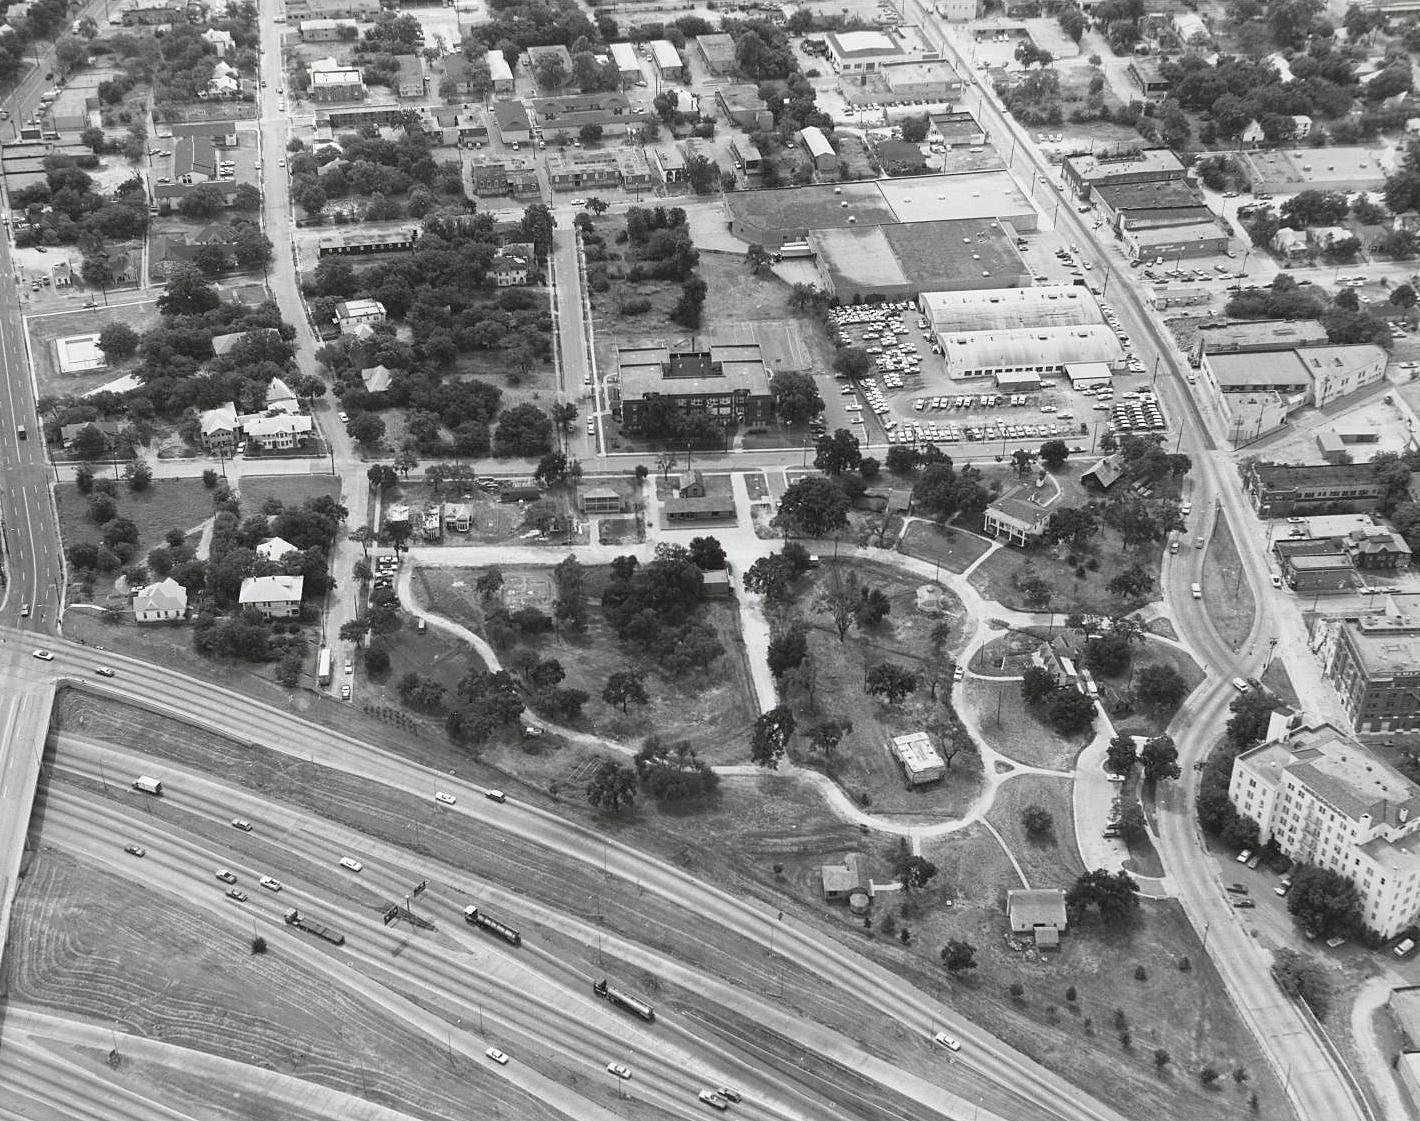 1975_city-park_aerial_squire-haskins_1975_dallas-municipal-archives_portal